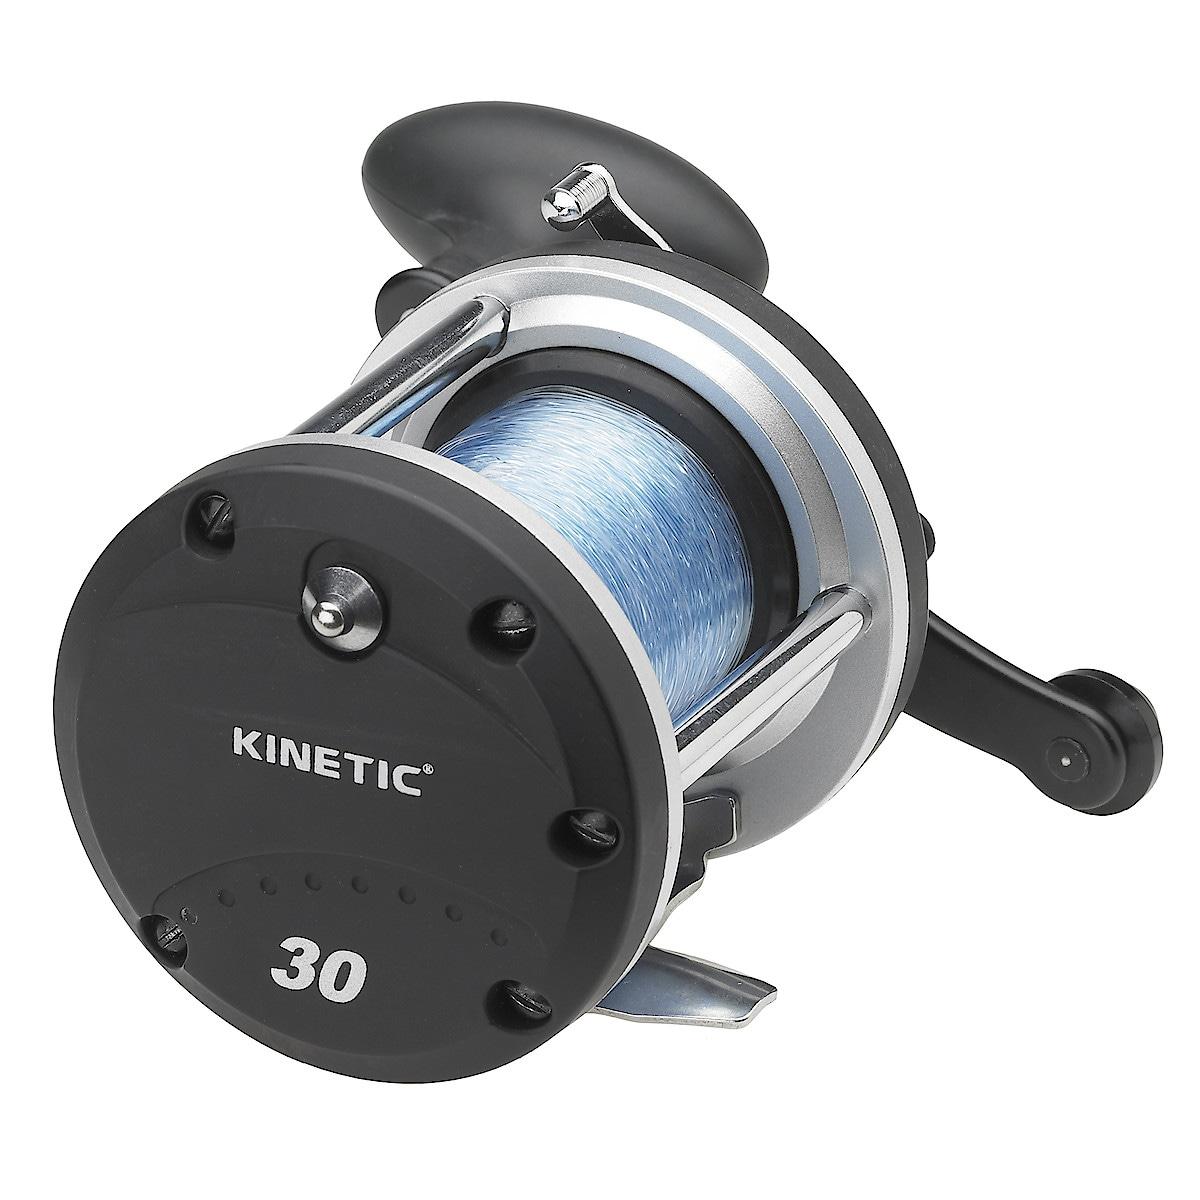 Kinetic Boat Fishing Combo, fiskesett 6' 300-400 g